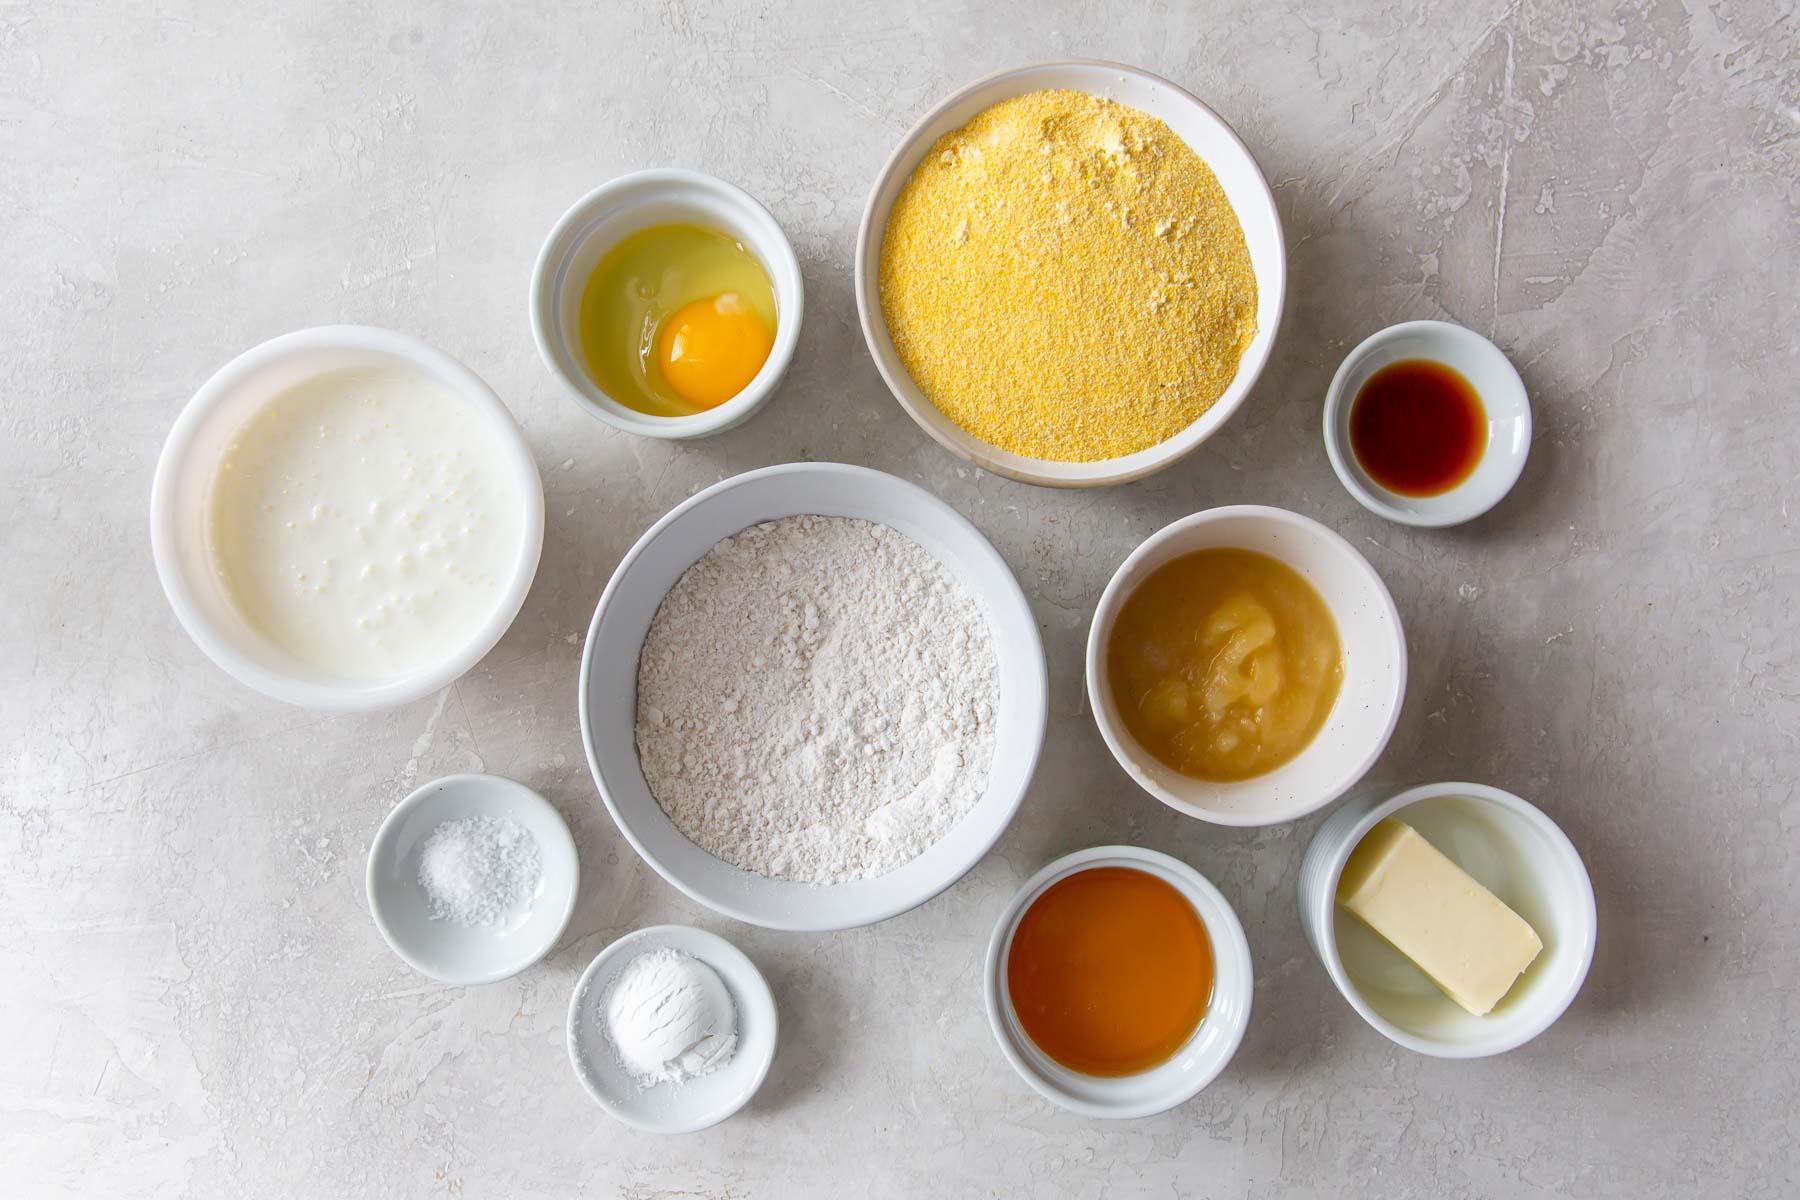 ingredients for cornbread recipe